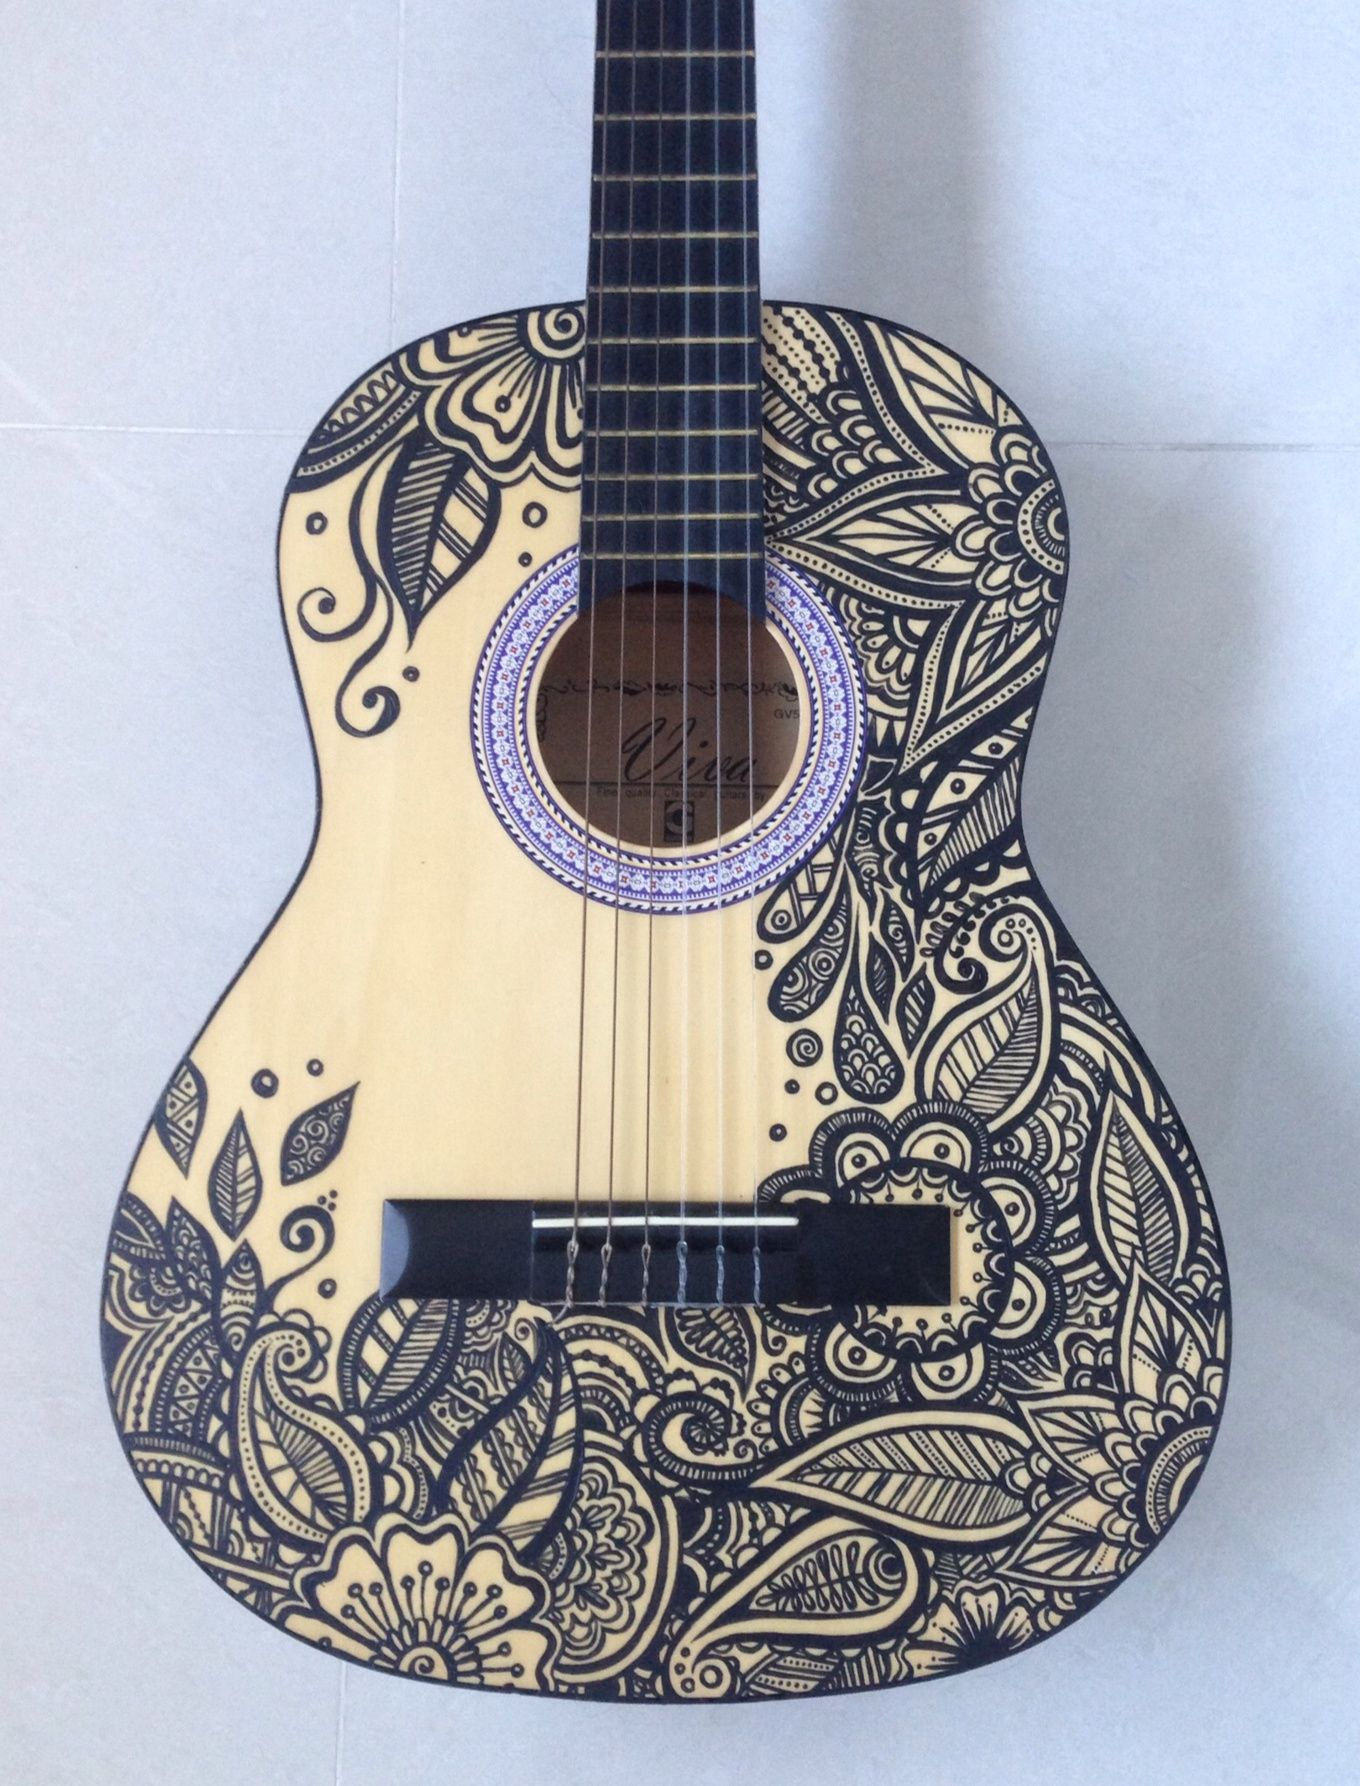 Newest Art Project Painted Guitar Ukulele Art Acoustic Guitar Art Guitar Art